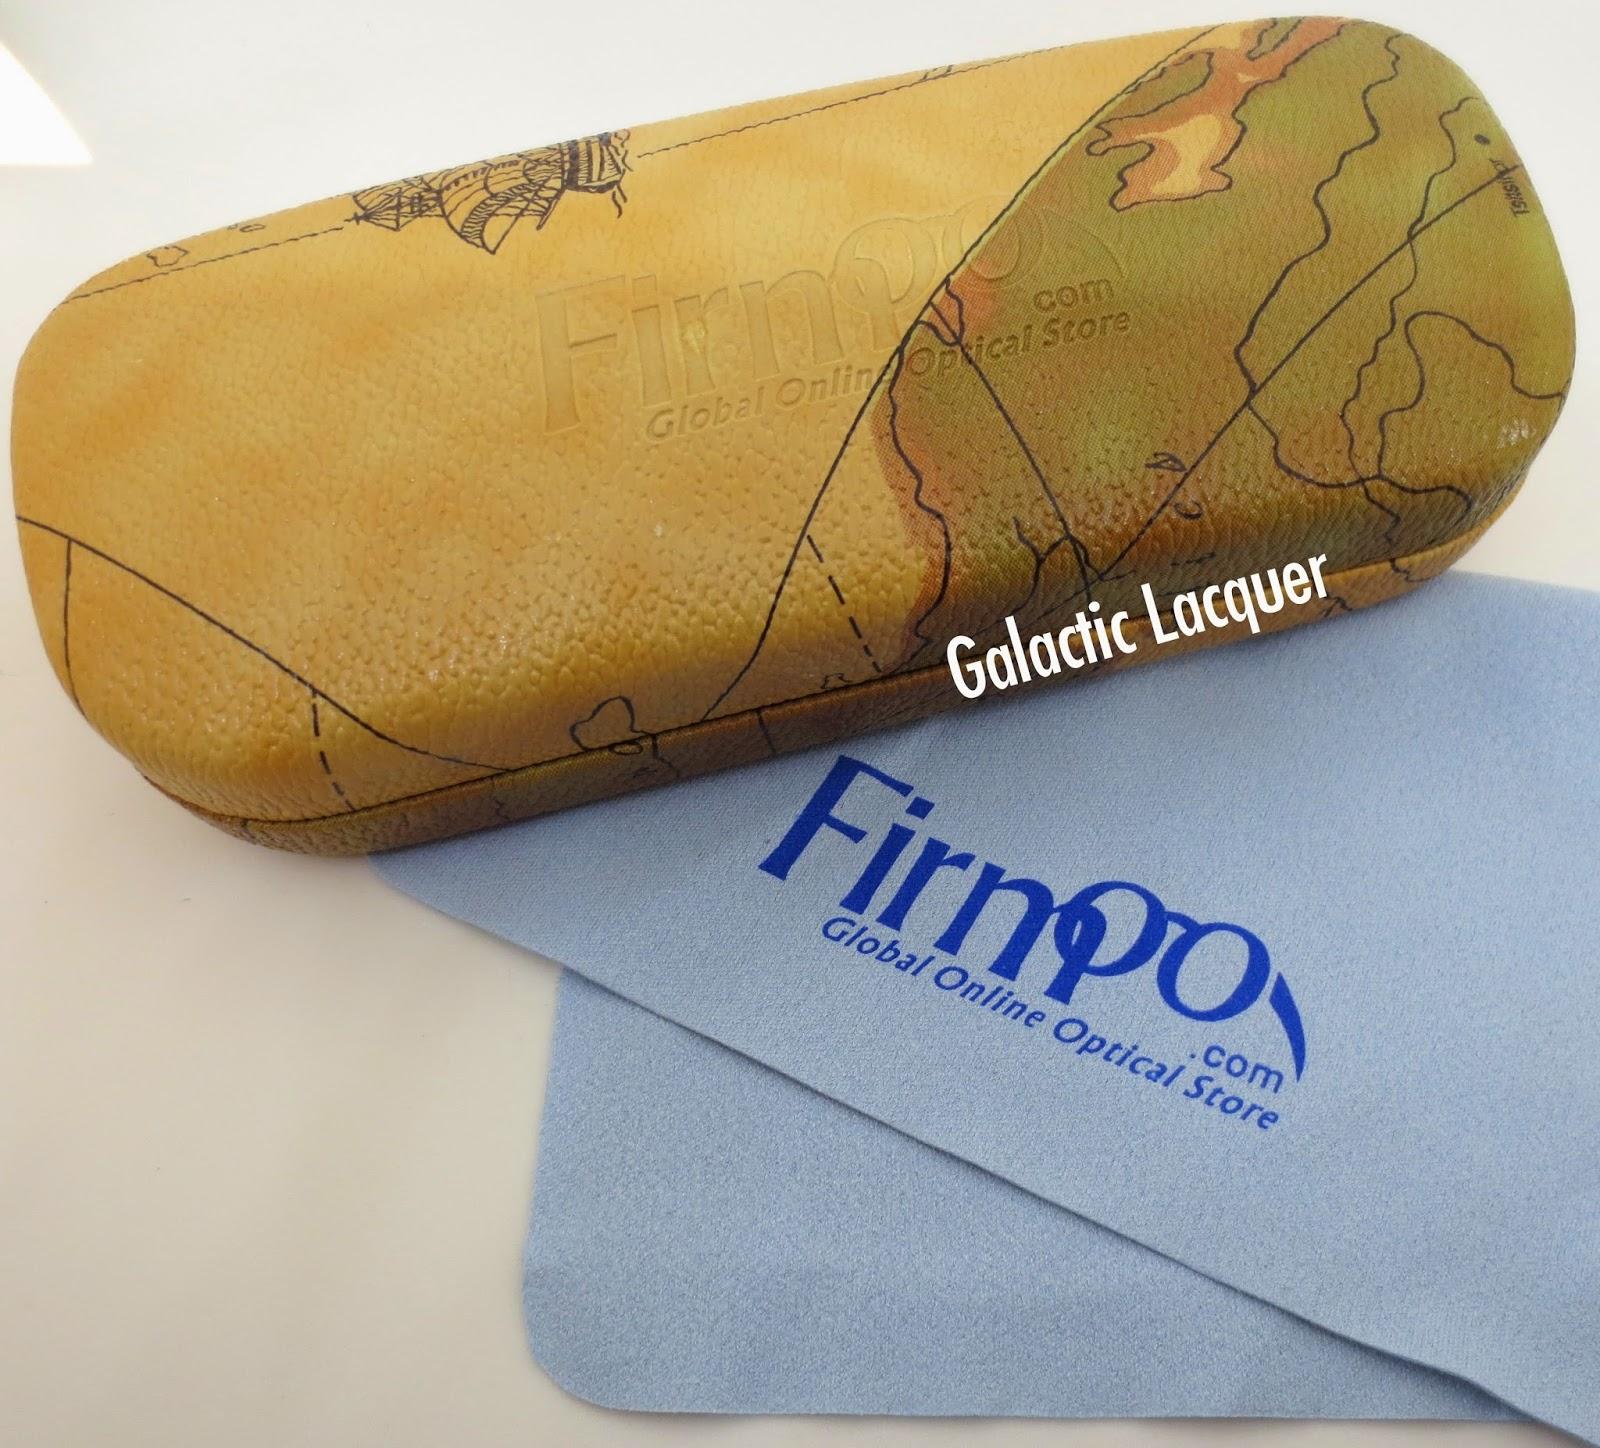 f28895ff6bc Galactic Lacquer  Firmoo - Blue Tortoise Sunglasses